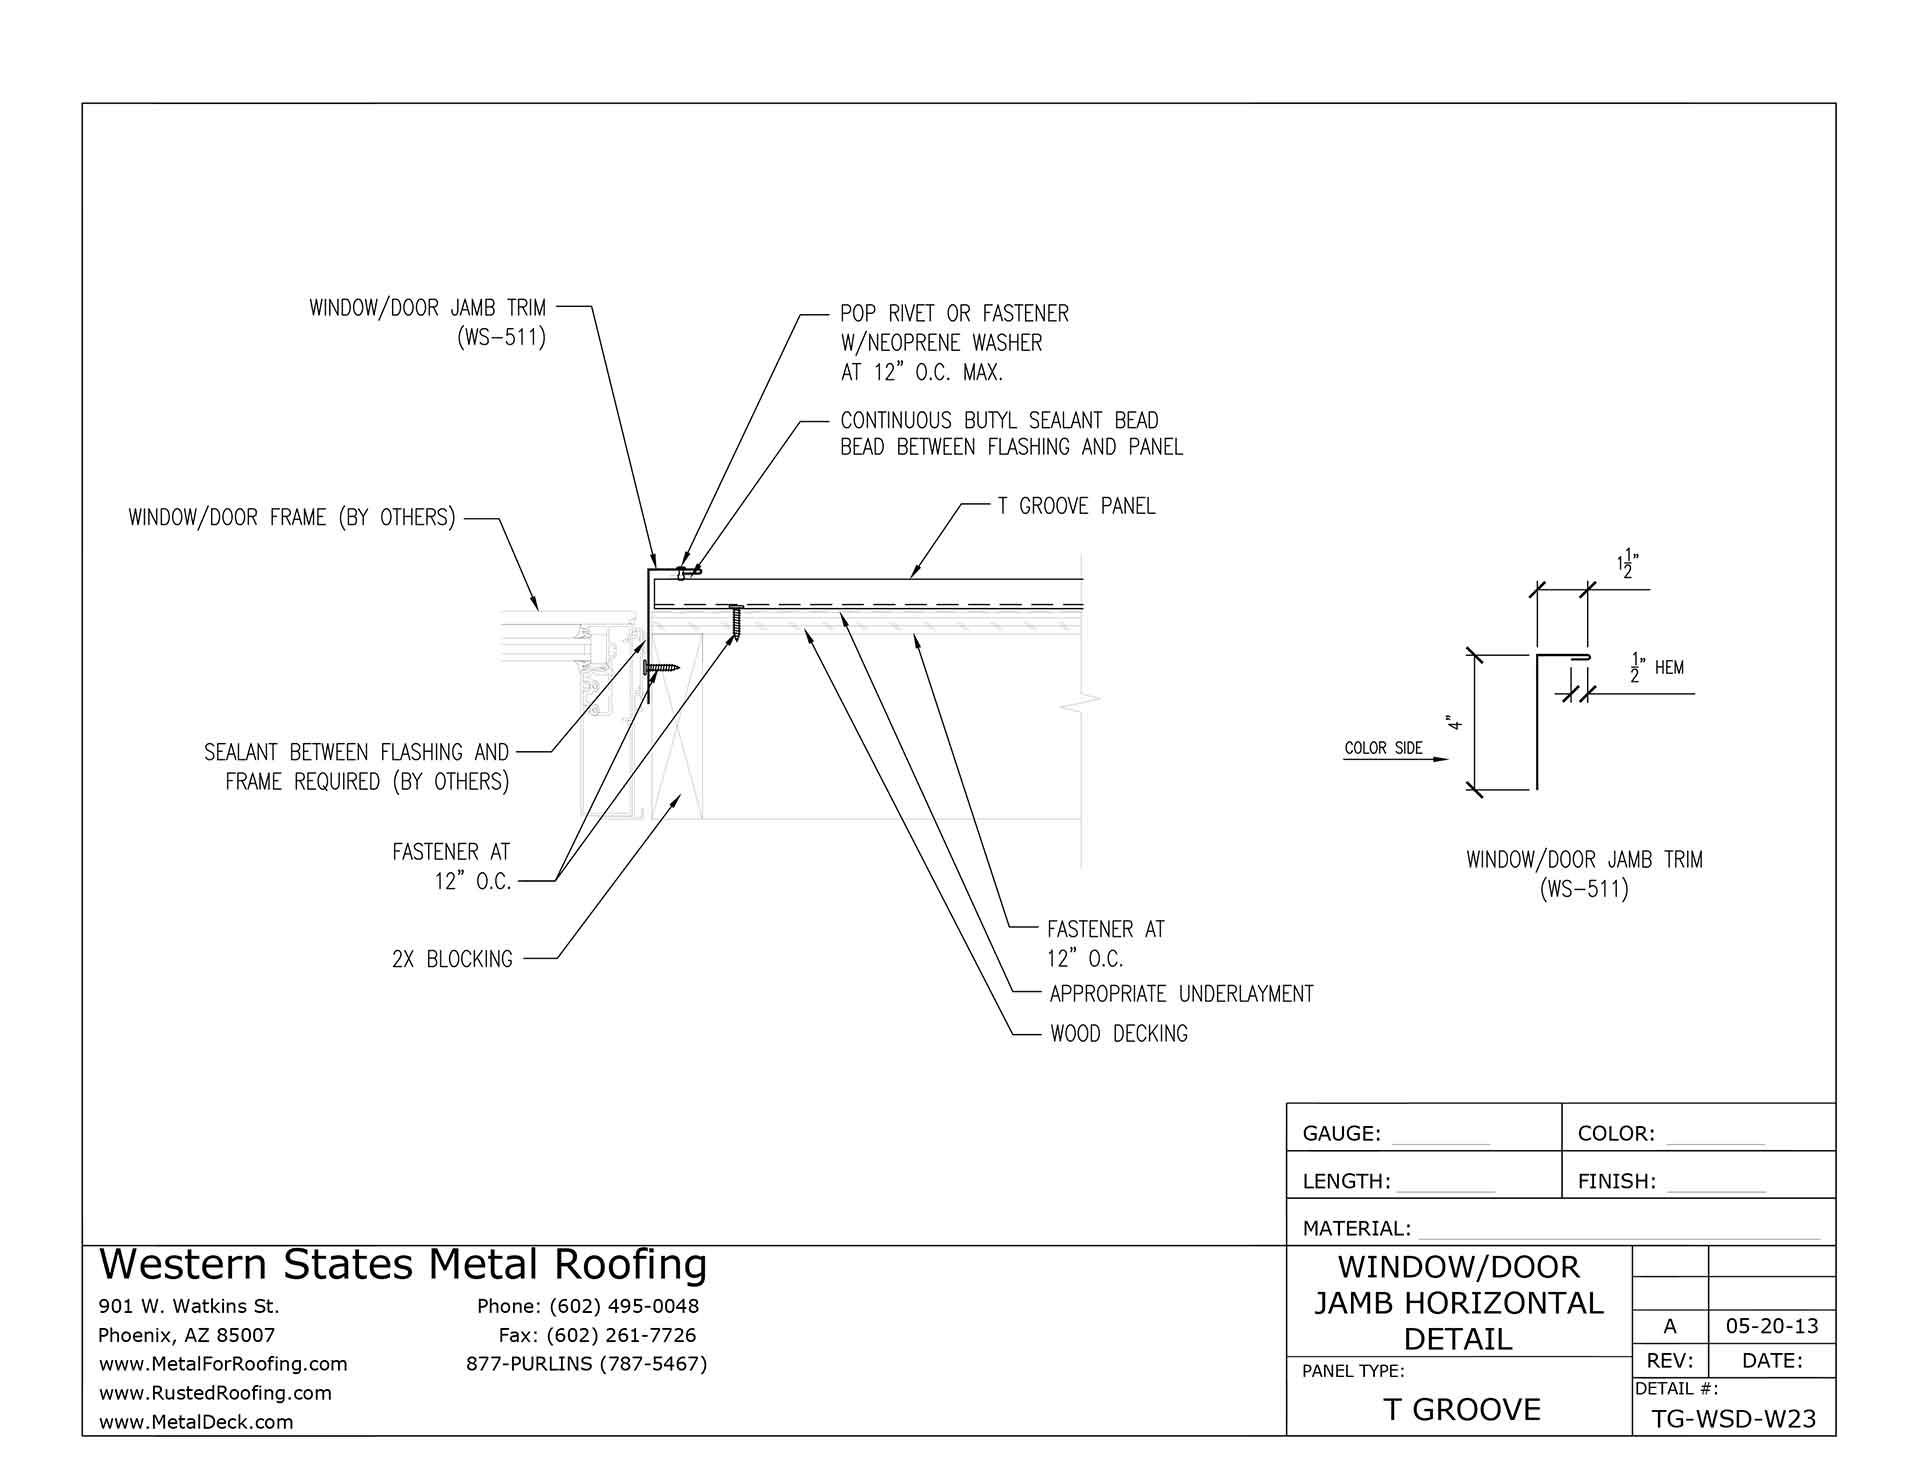 https://f.hubspotusercontent30.net/hubfs/6069238/images/trim-flashings/t-groove/tg-wsd-w23-window-door-jamb-horizontal-detail.jpg